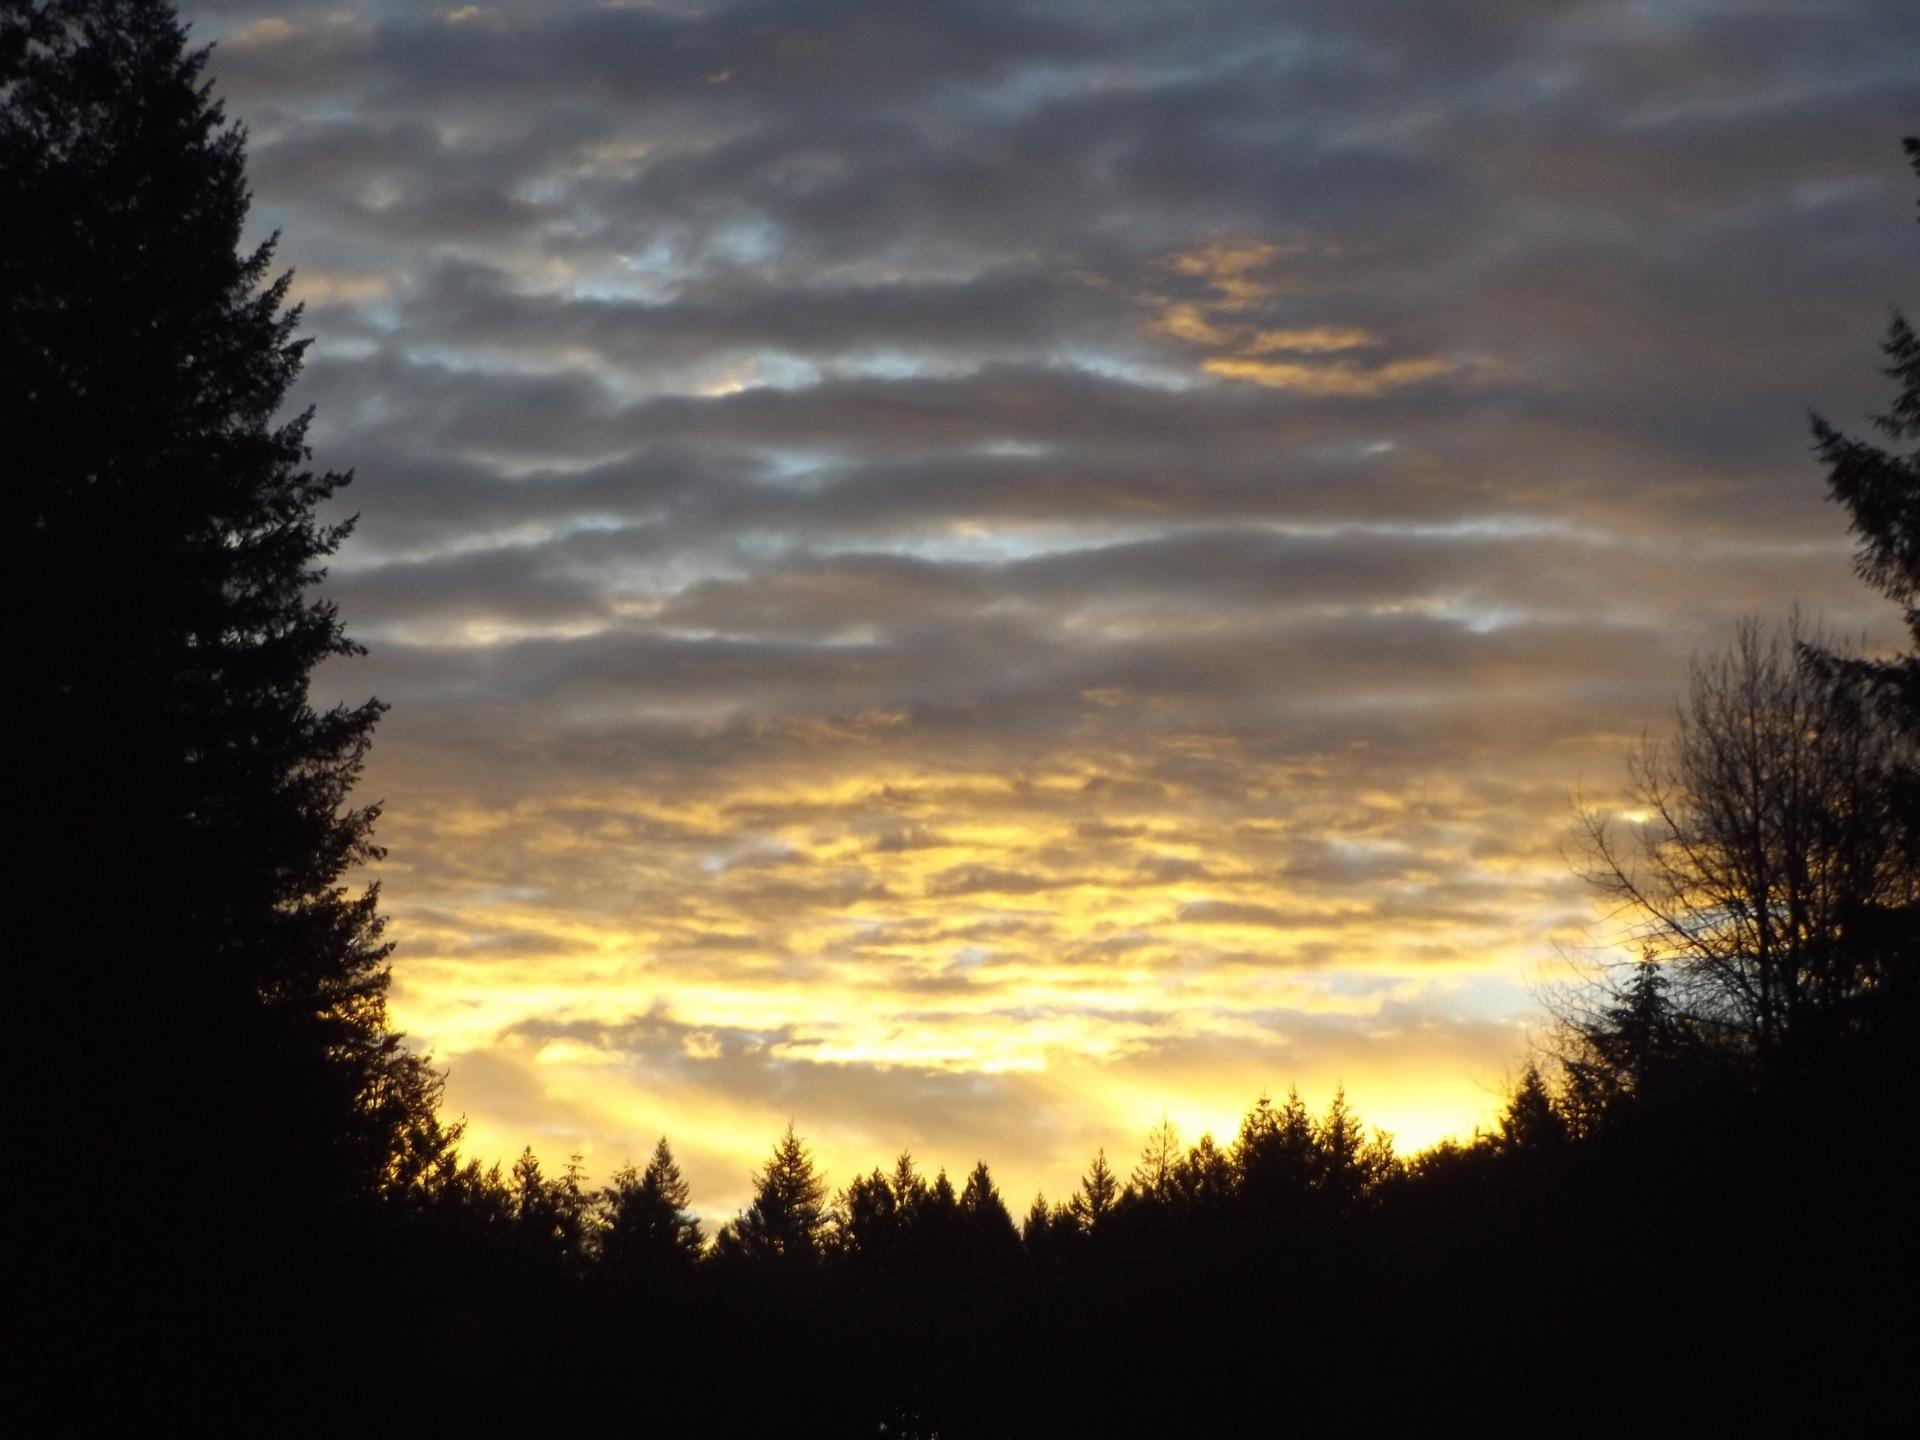 sunset | no person, dawn, tree, sun